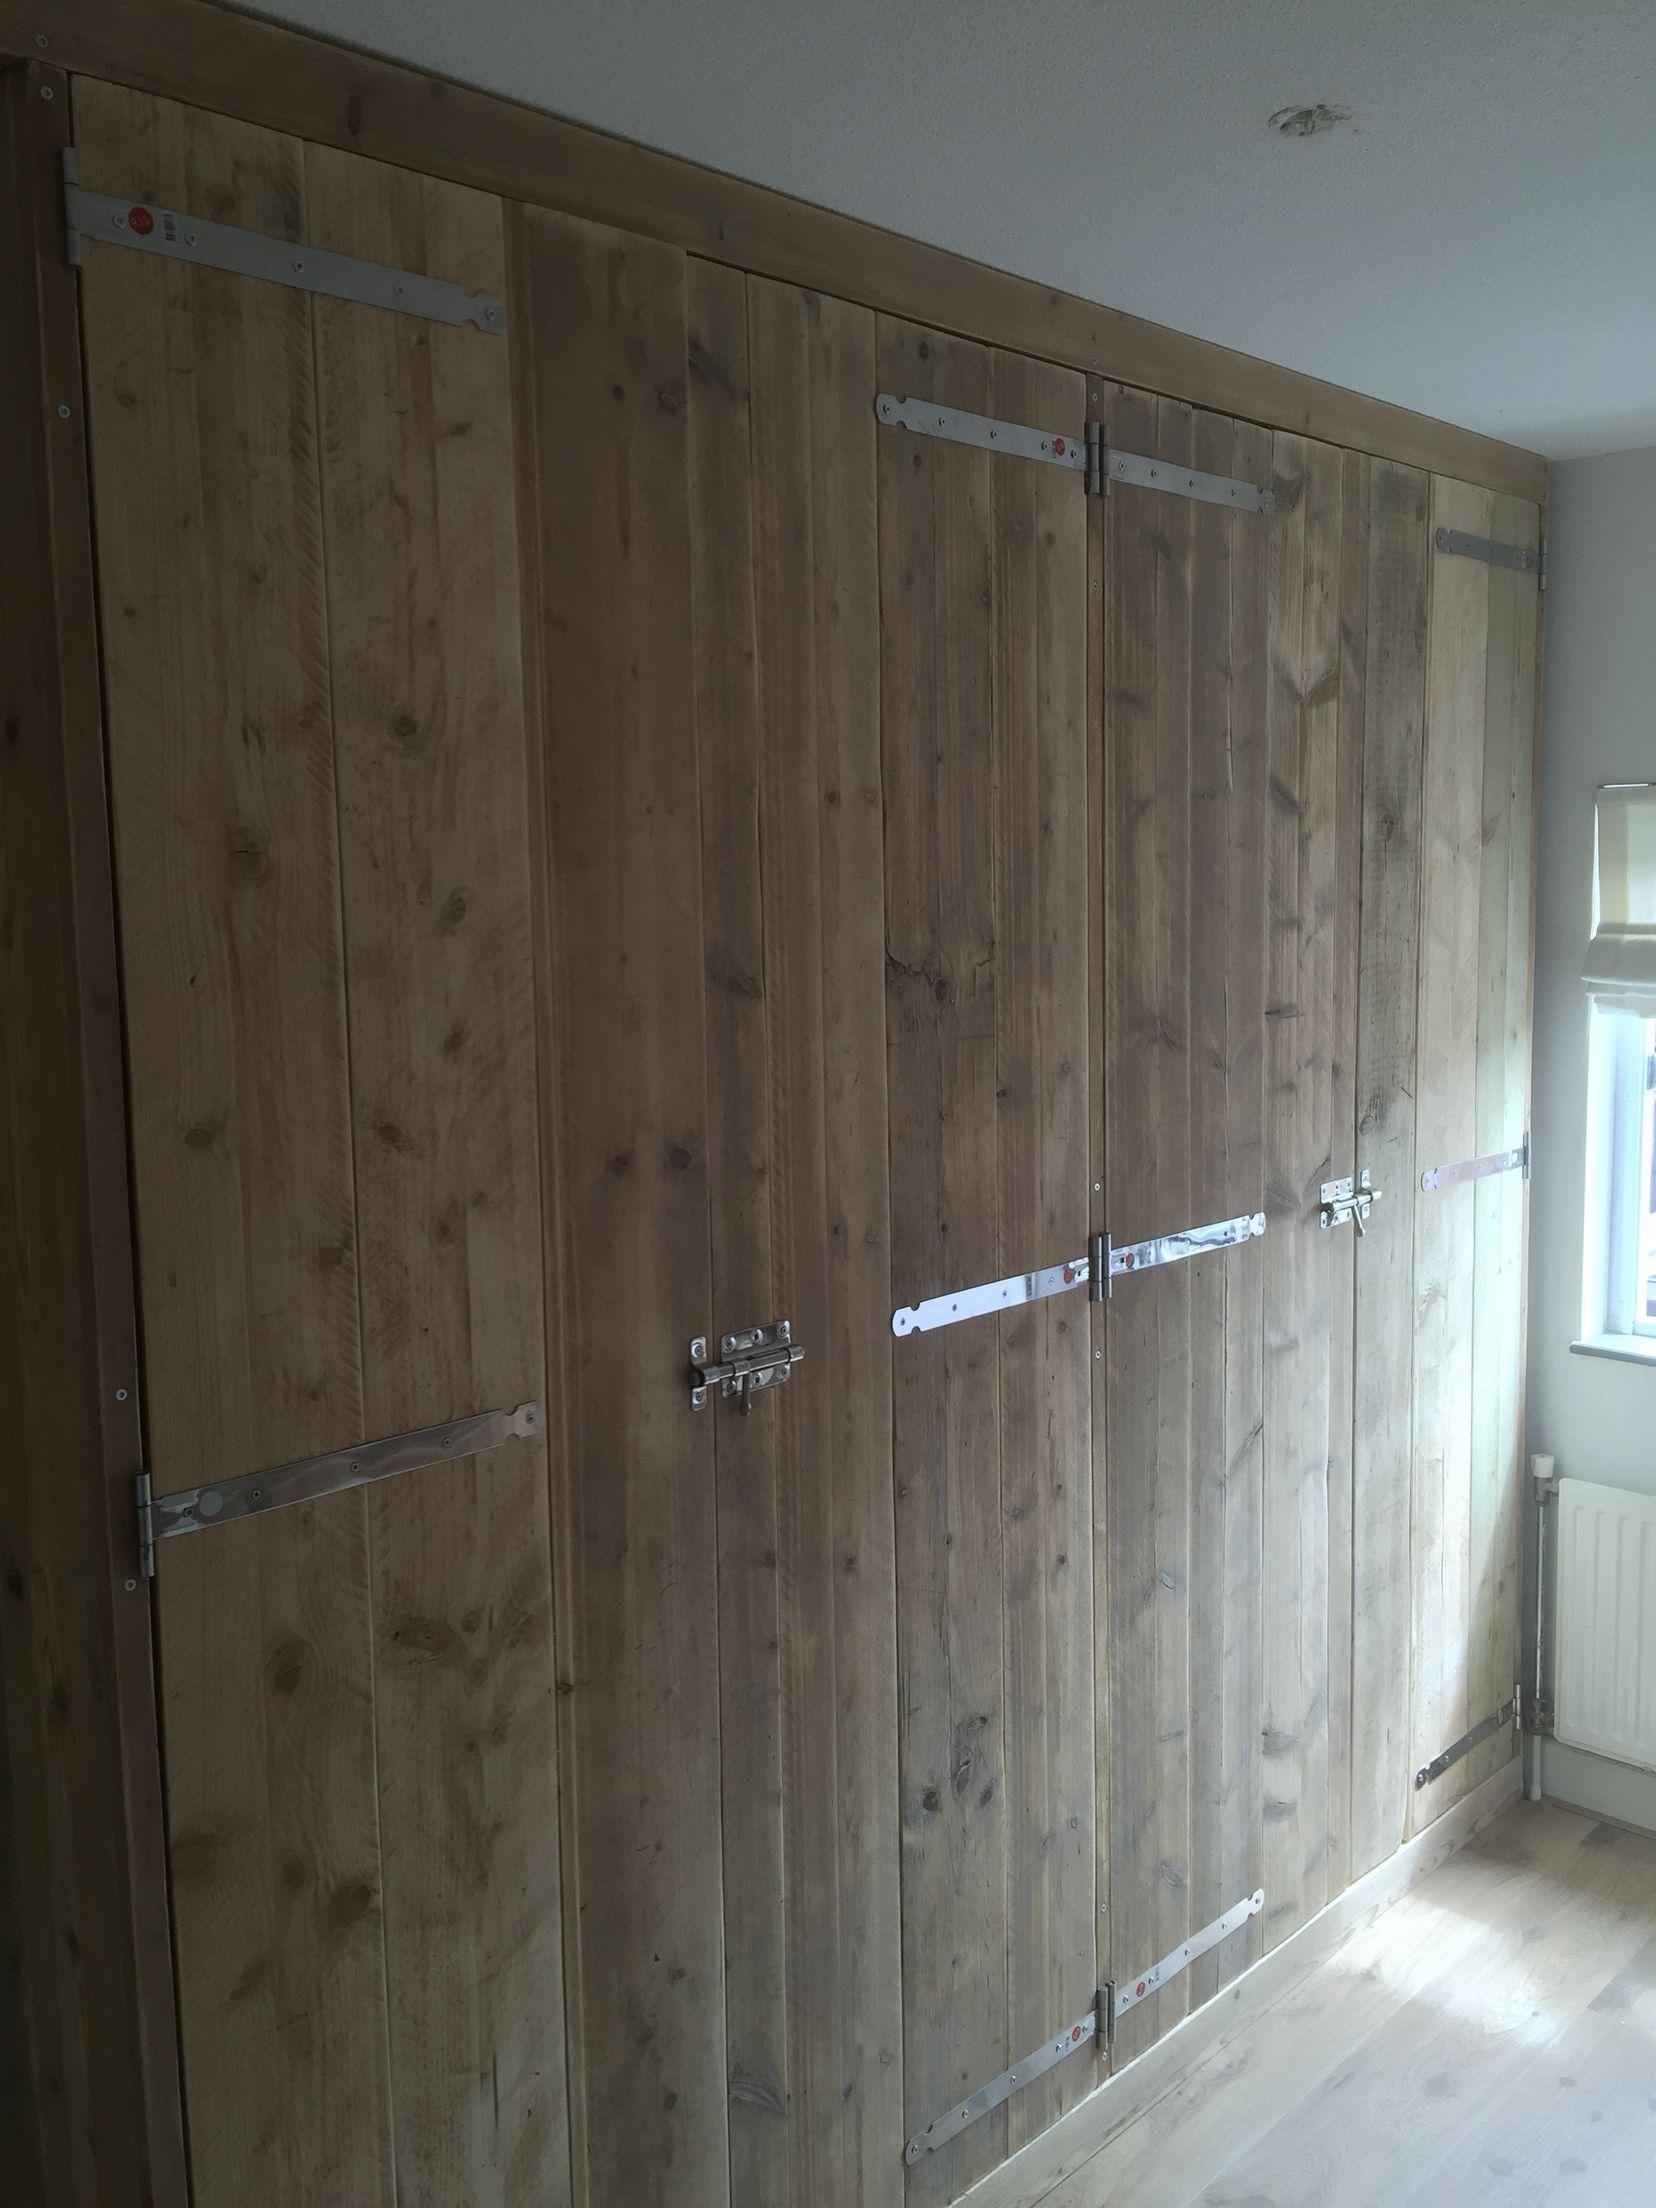 Wandkast Voor Kleding.Kleding Kast Steigerhout Pristupova Cesta Home Home Decor En